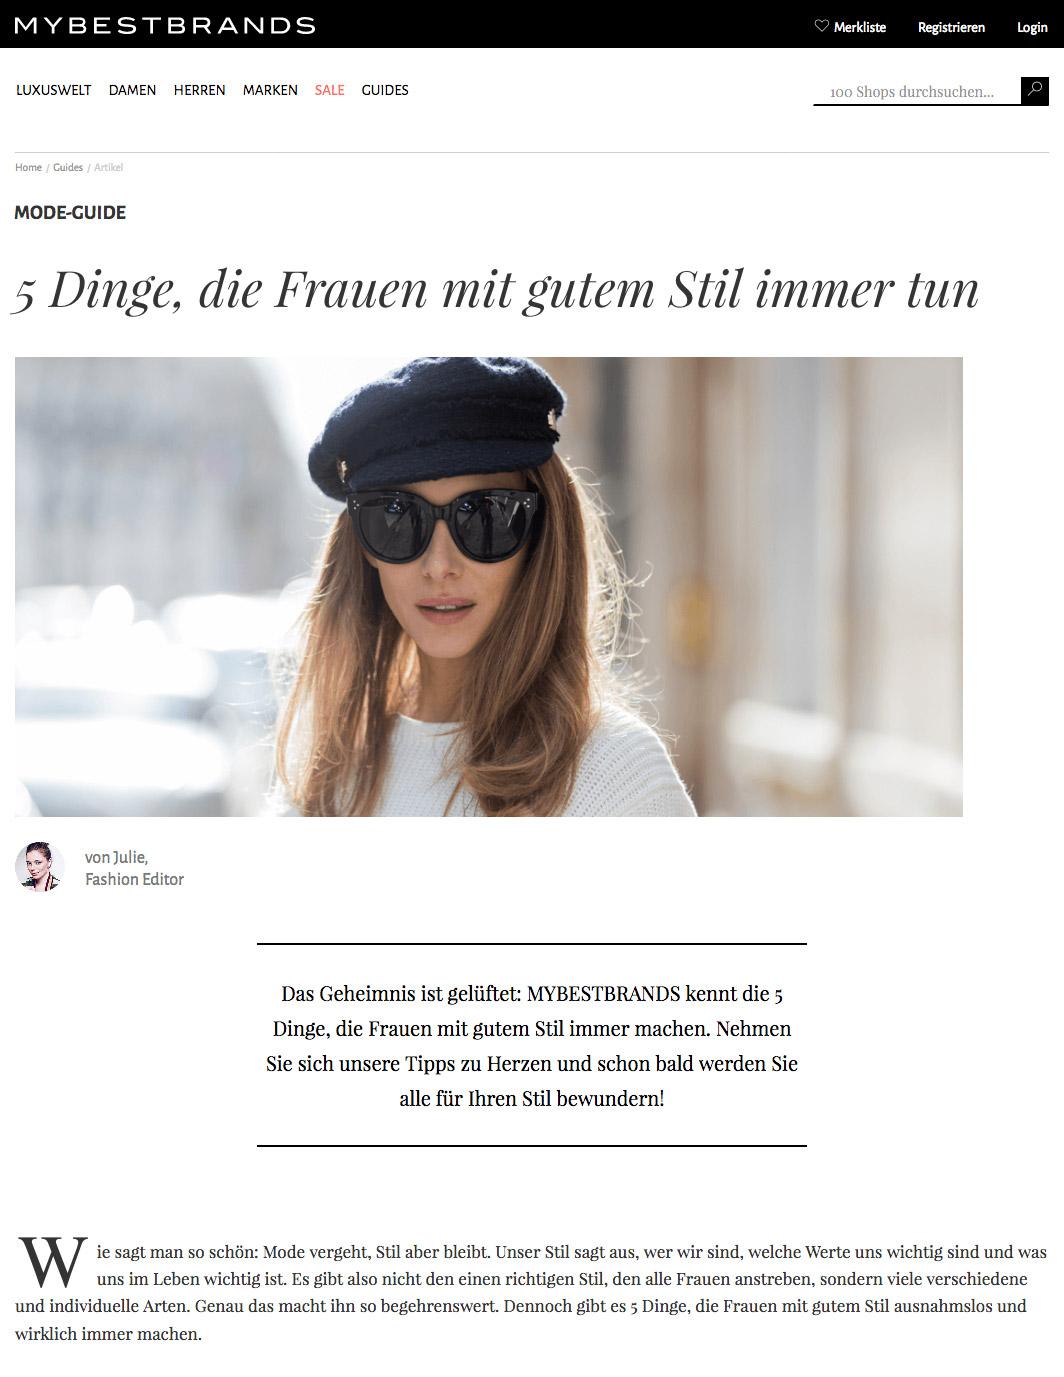 5 Dinge die Frauen mit gutem Stil immer tun - MYBESTBRAND - 2017 04 - Alexandra Lapp - found on https://www.mybestbrands.de/guides/5-dinge-frauen-gutem-stil-tun/?utm_source=outbrain&utm_medium=cpc&utm_campaign=FRAUENSTIL&utm_content=5+Dinge%2C+die+Frauen+mit+gutem+Stil+immer+tun&utm_term=Regional